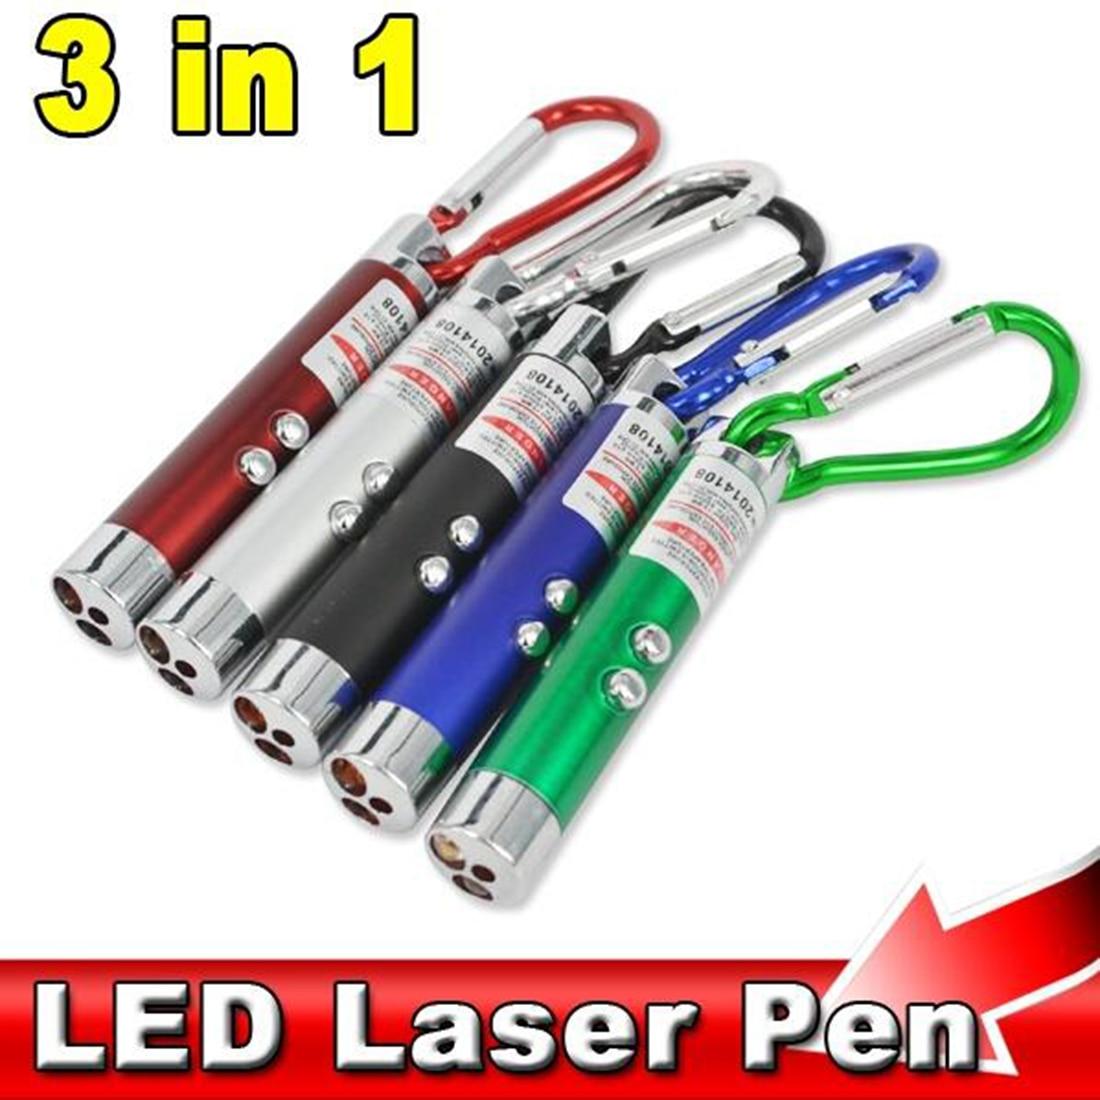 Etmakit Hot 3 In 1 Red Laser Pointer Pen Flashlight Counterfeit Money Detector Climbing Hook